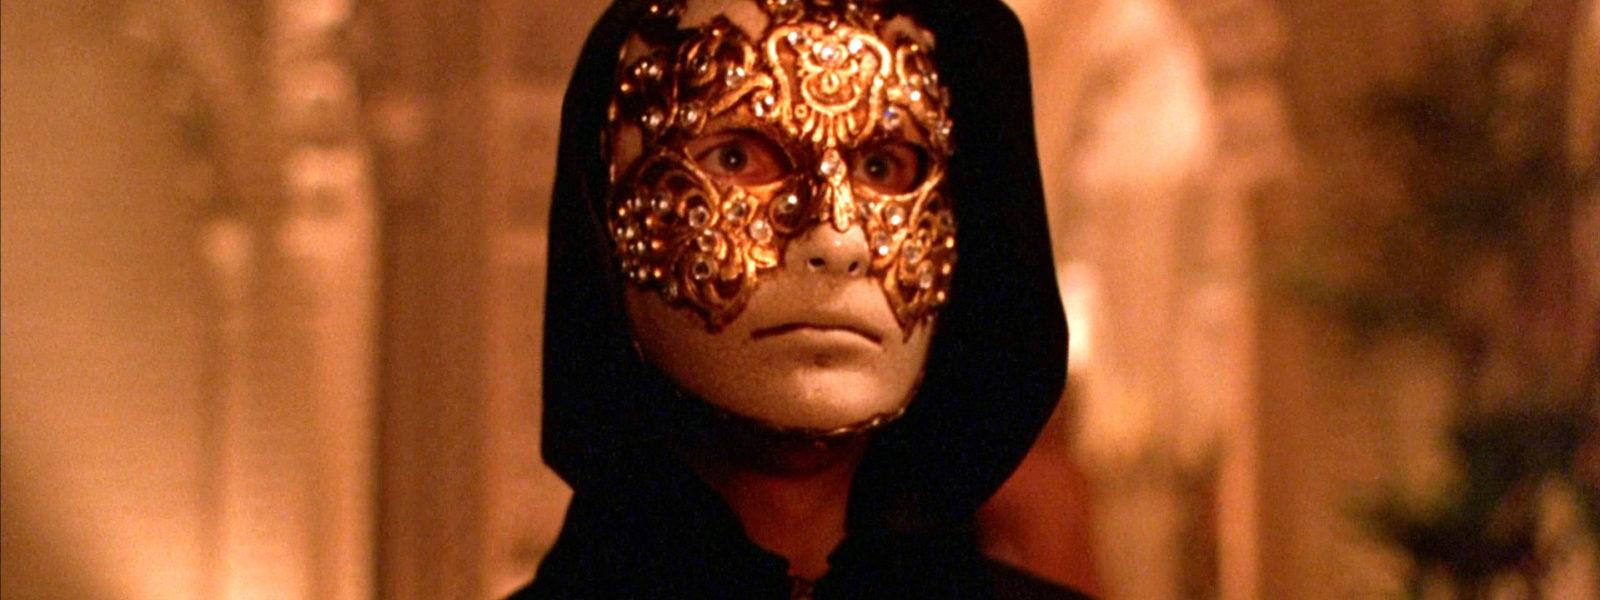 Tom Cruise in mask in Kubrick, Eyes Wide Shut, 1999,